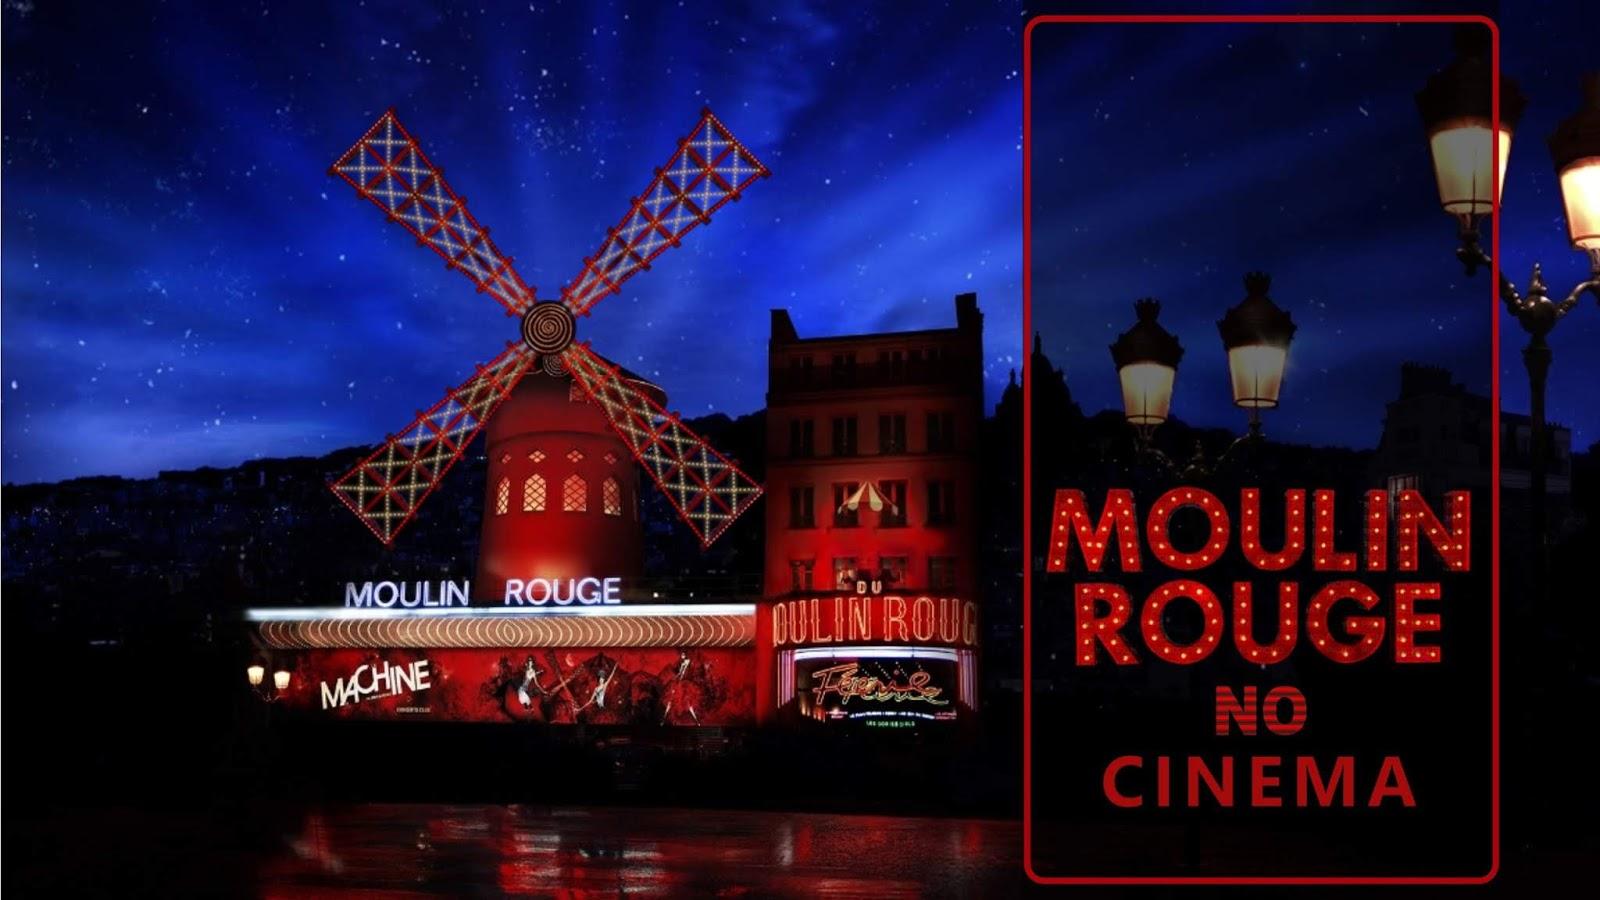 moulin-rouge-no-cinema